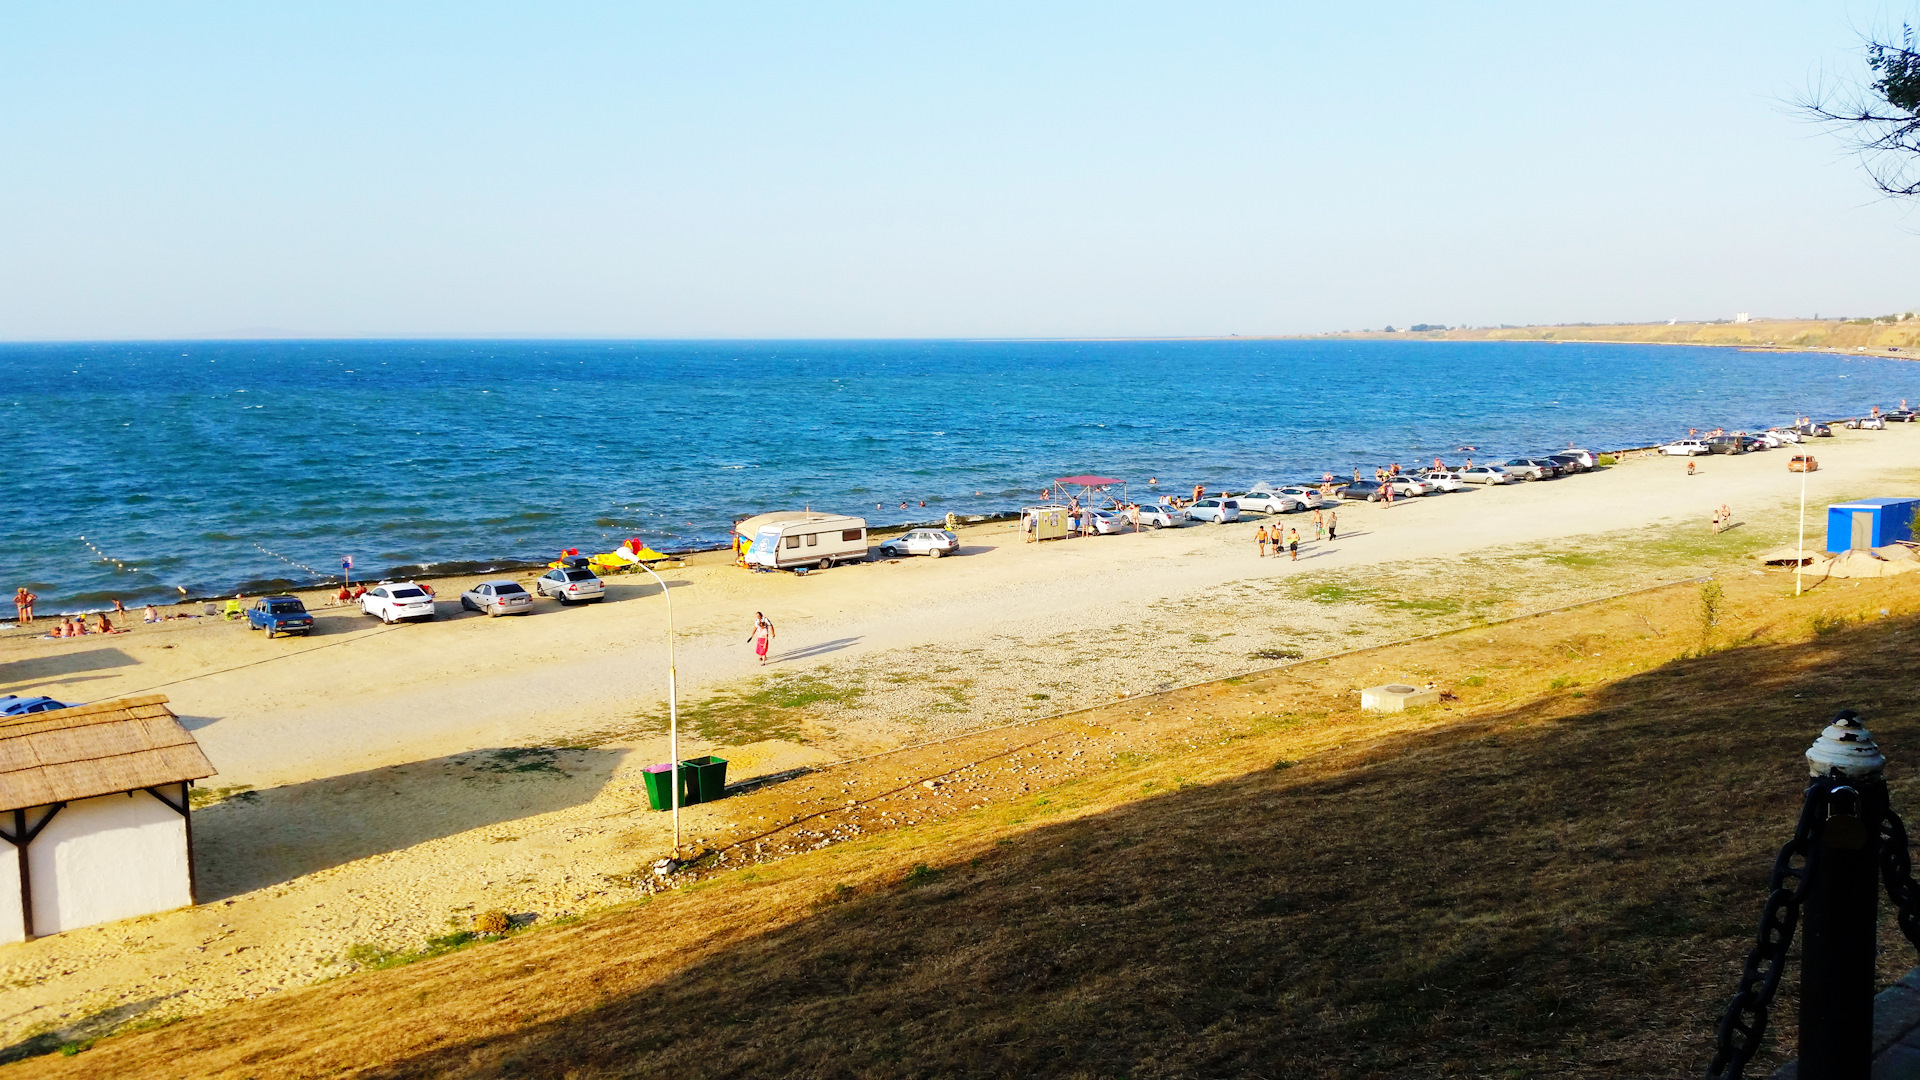 тамань краснодарский край фото города пляжа море оникс, агат, морион